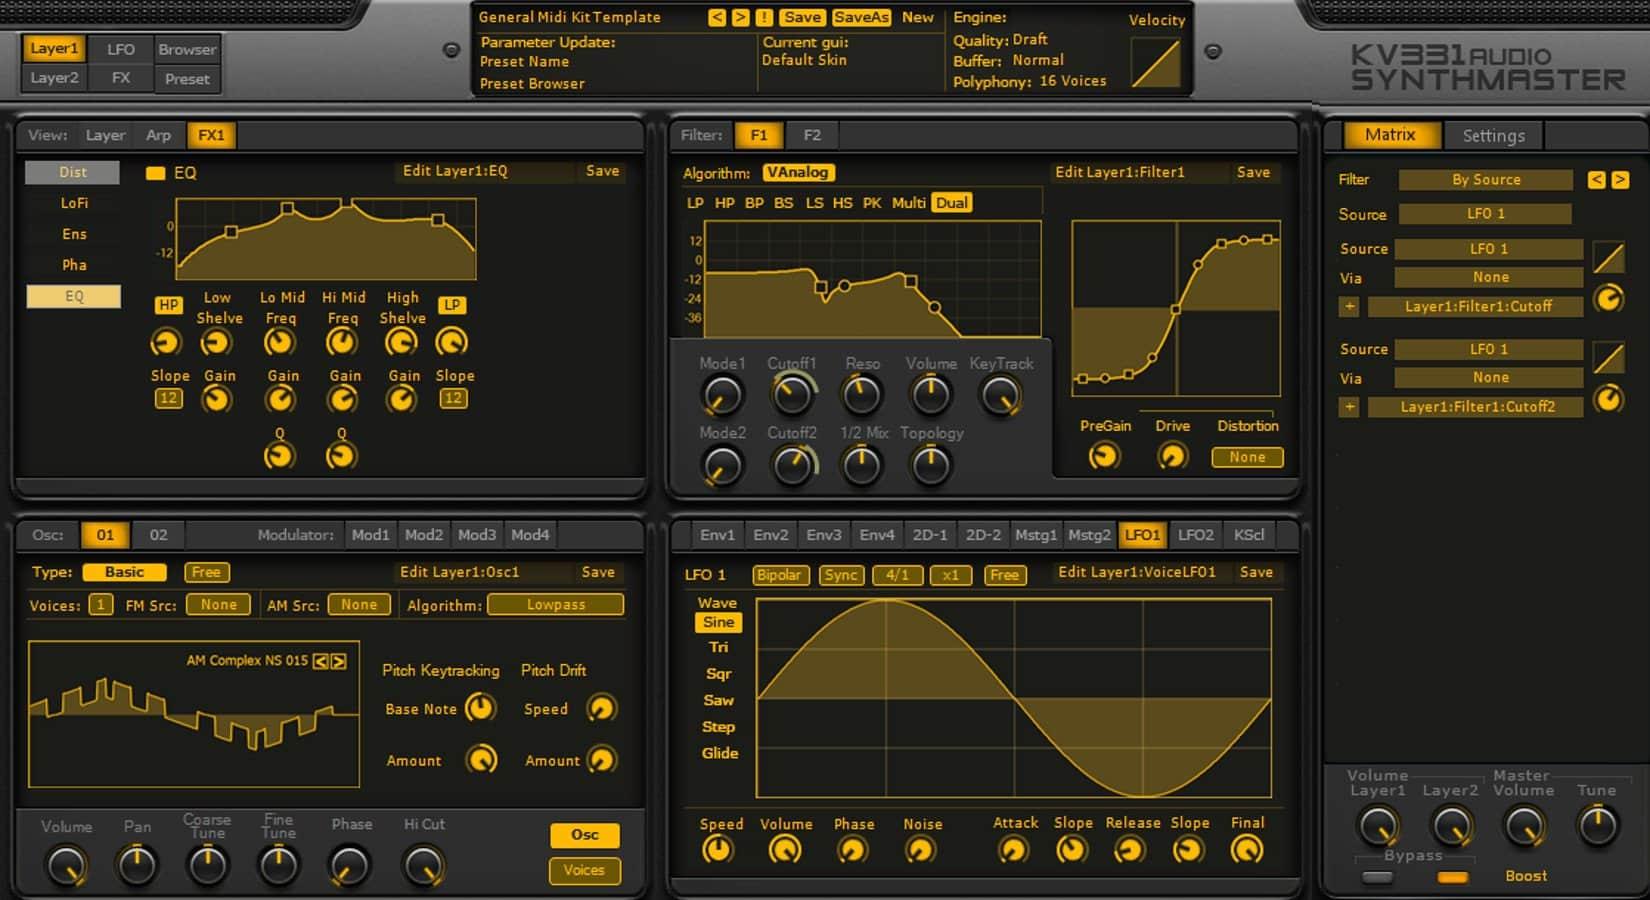 SynthMaster 3